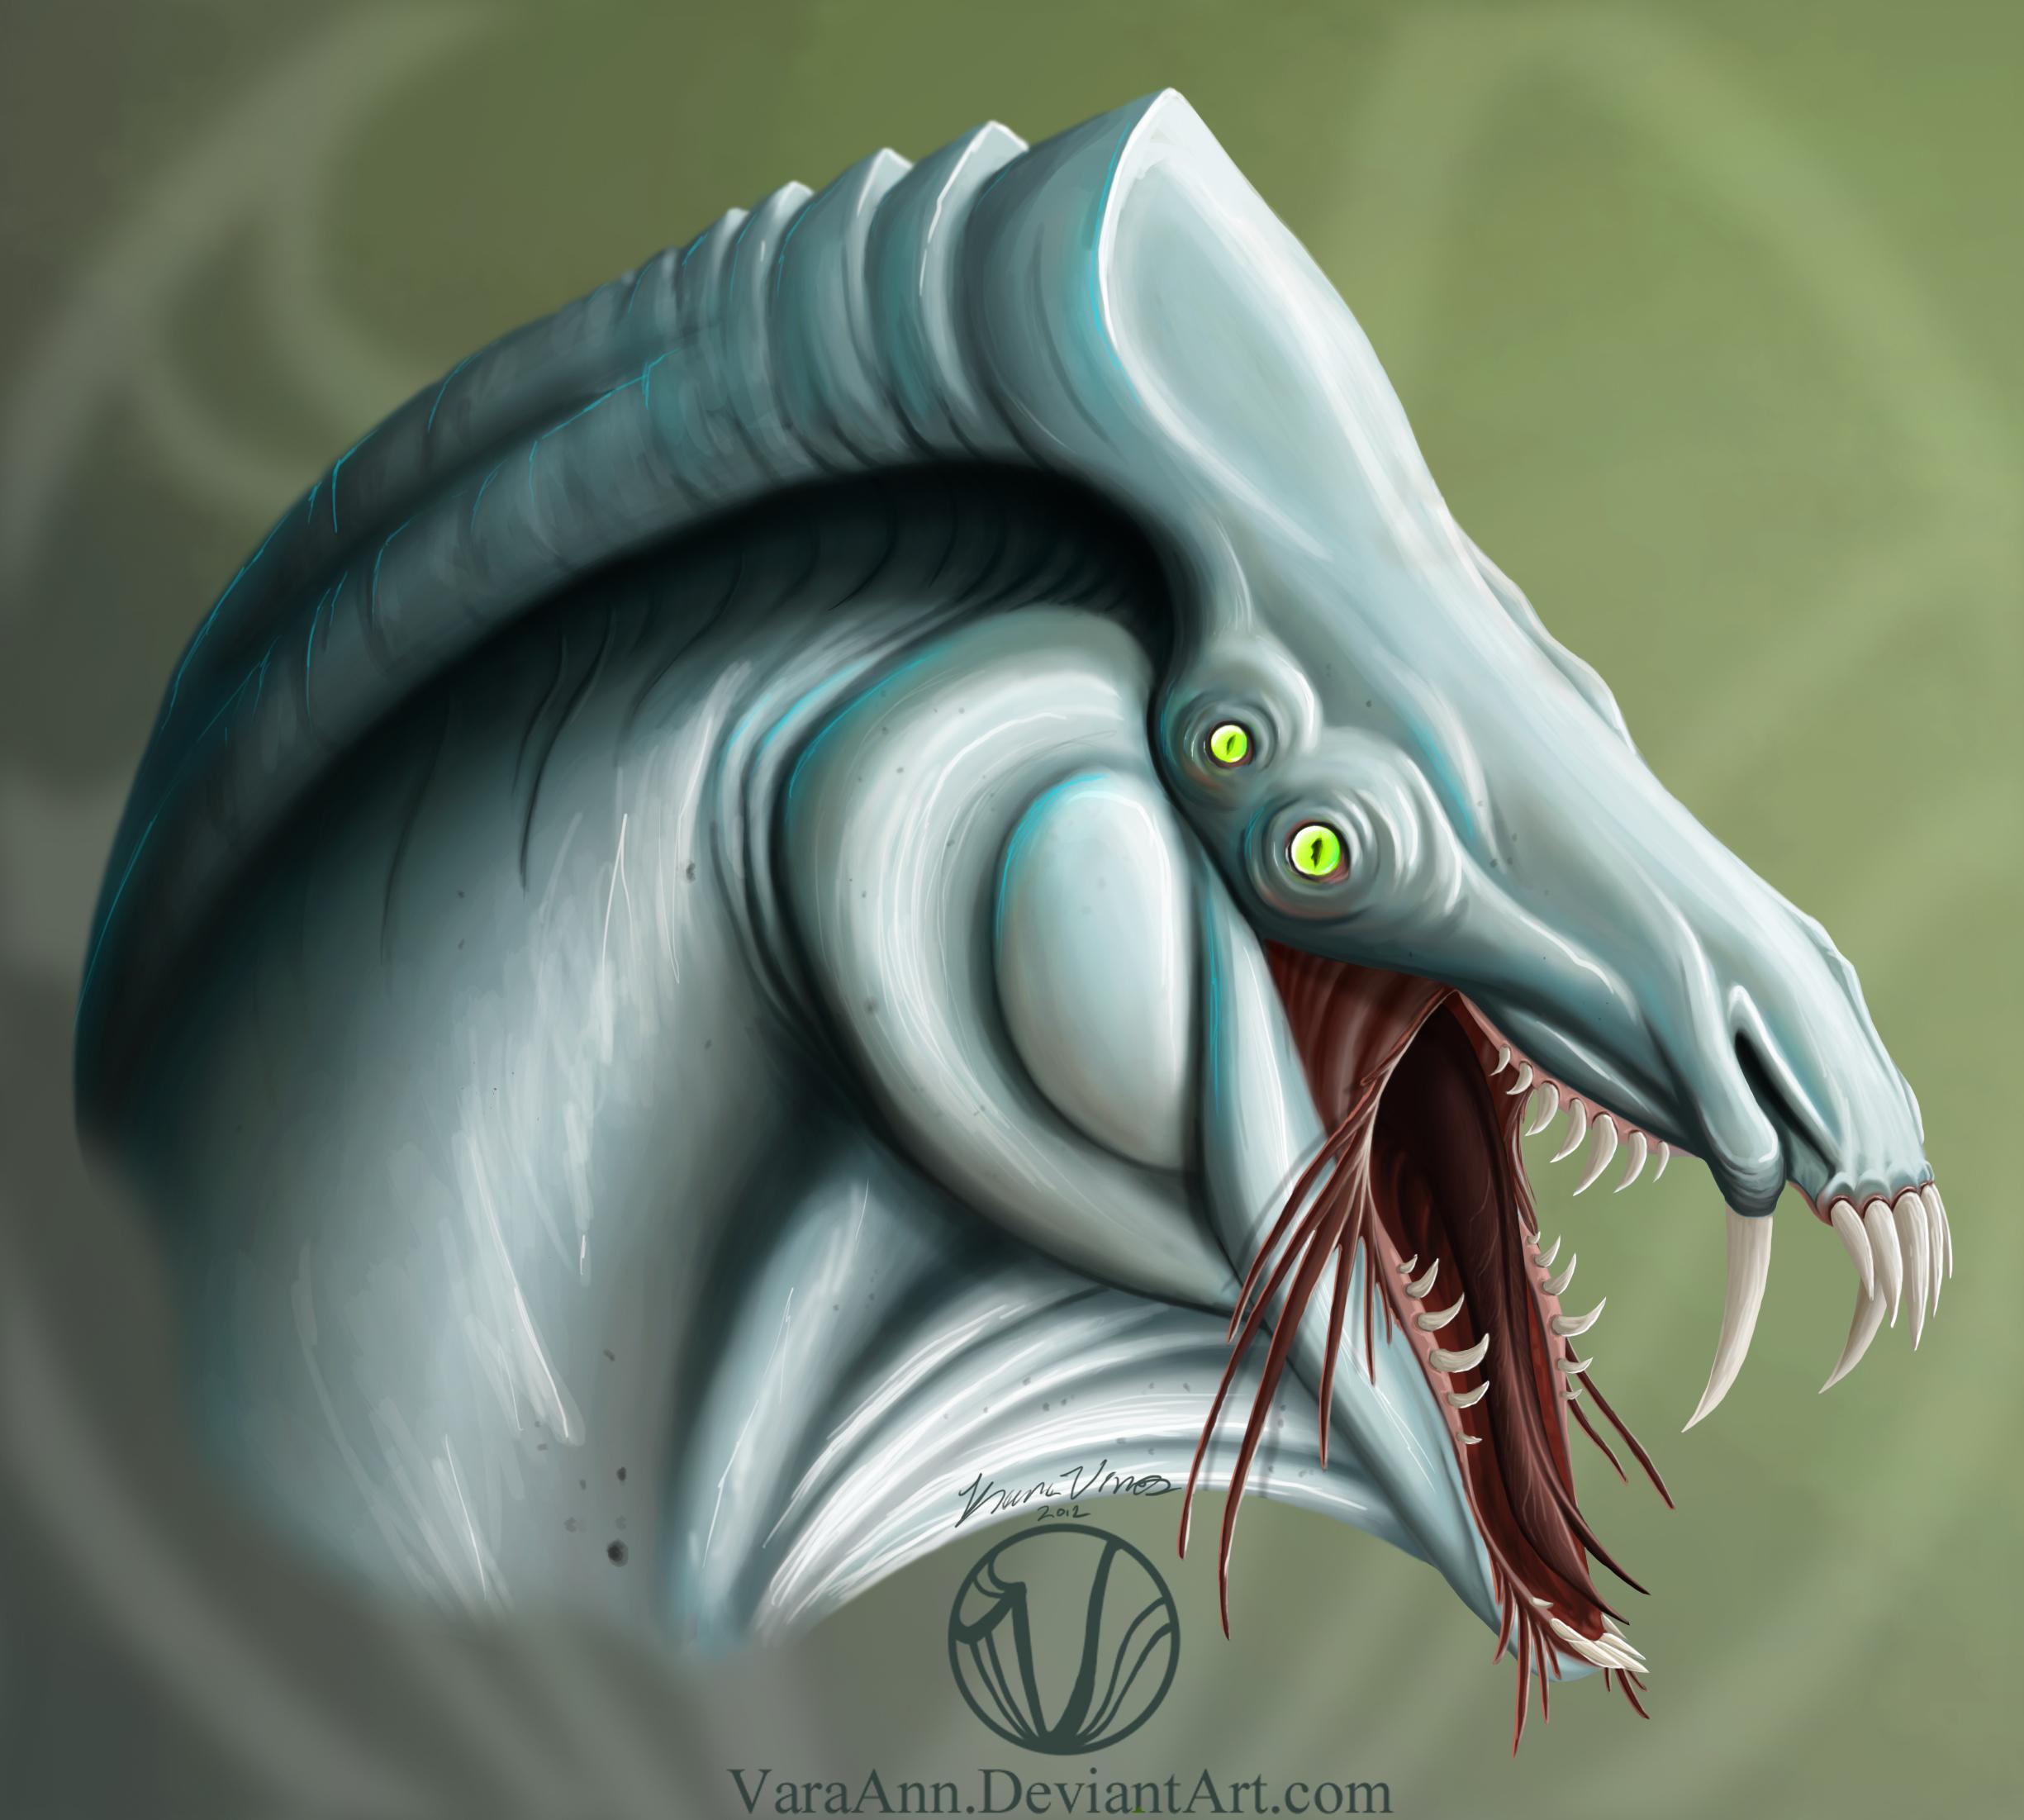 Alien Creature Concept by VaraAnn